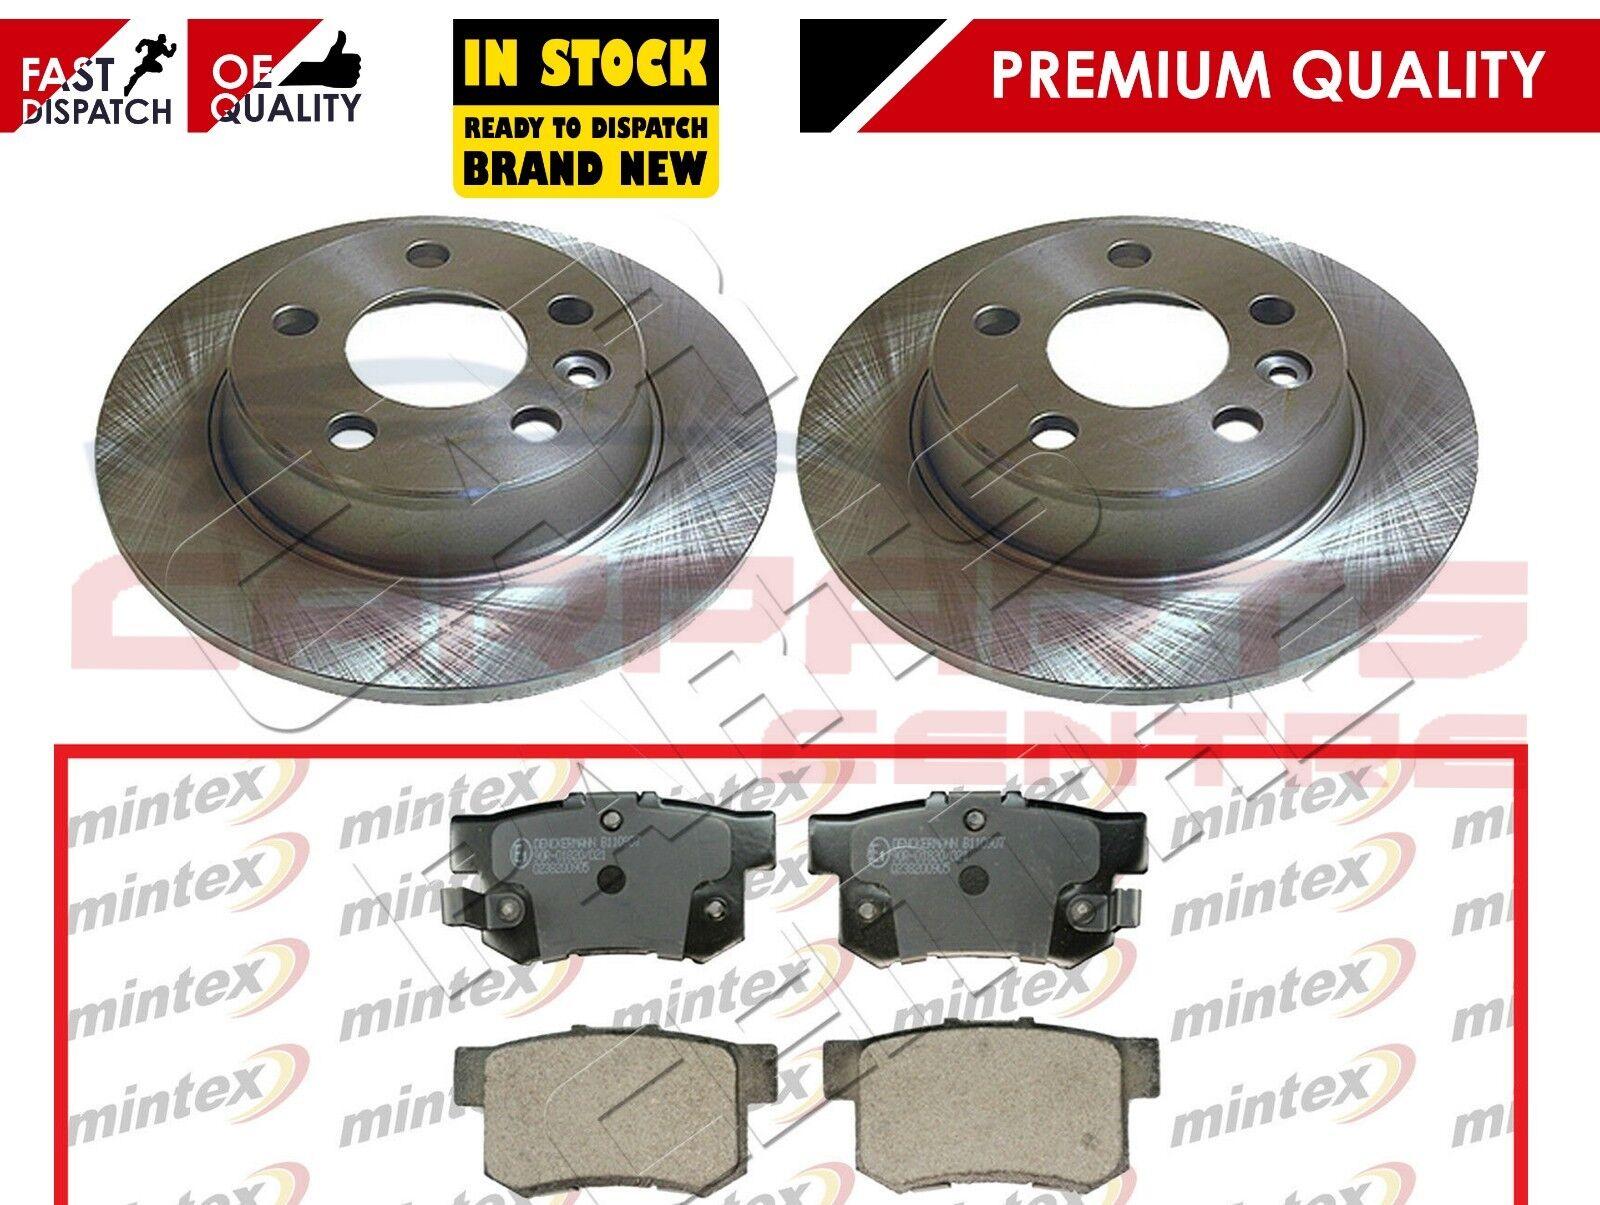 FOR PEUGEOT 206 2.0 GTi HDi FRONT /& REAR MINTEX BRAKE DISCS /& MINTEX BRAKE PADS